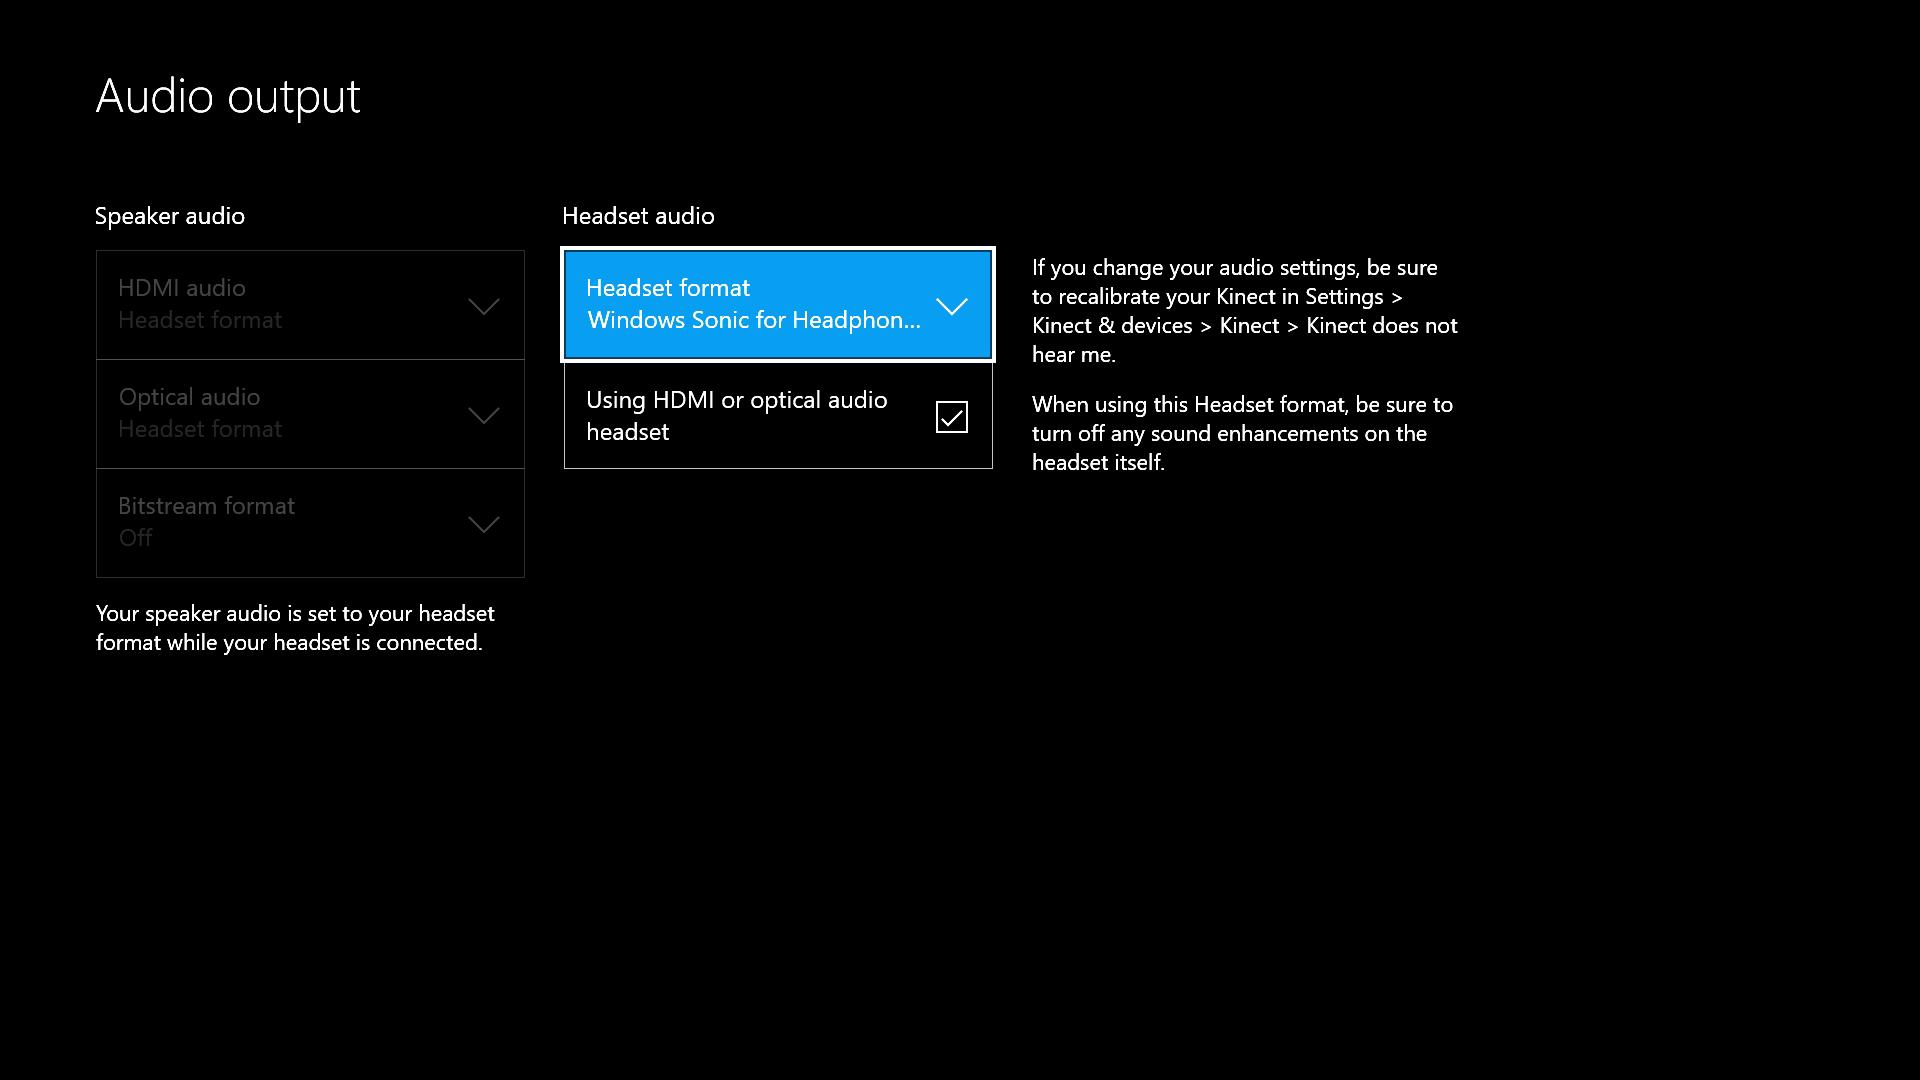 nhl application settings xbox one